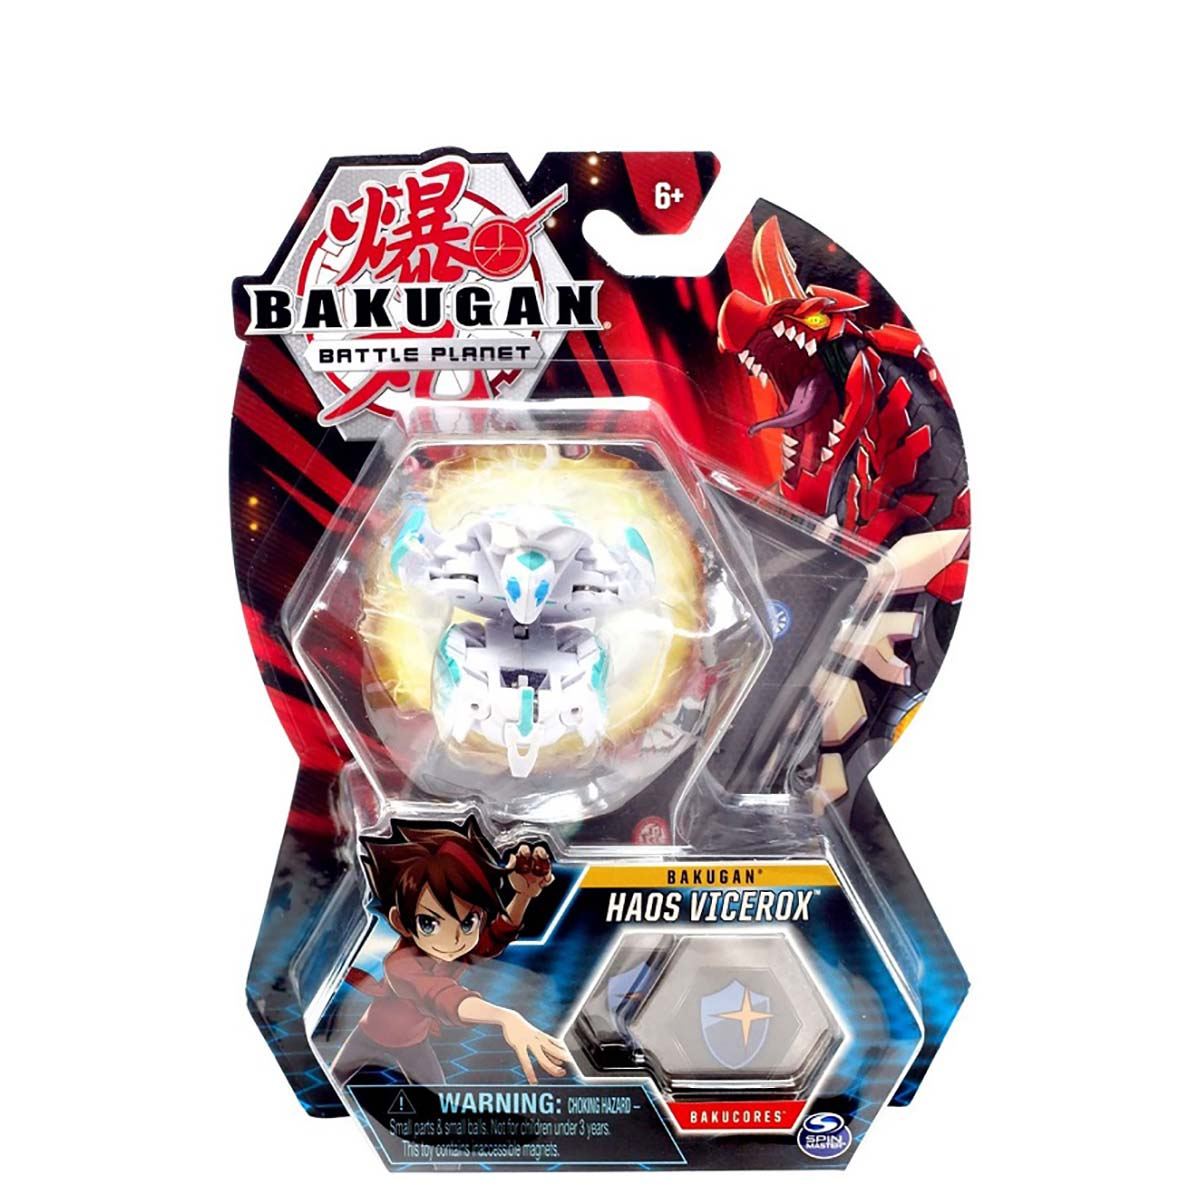 Figurina Bakugan Battle Planet, Haos Vicerox, 20118443